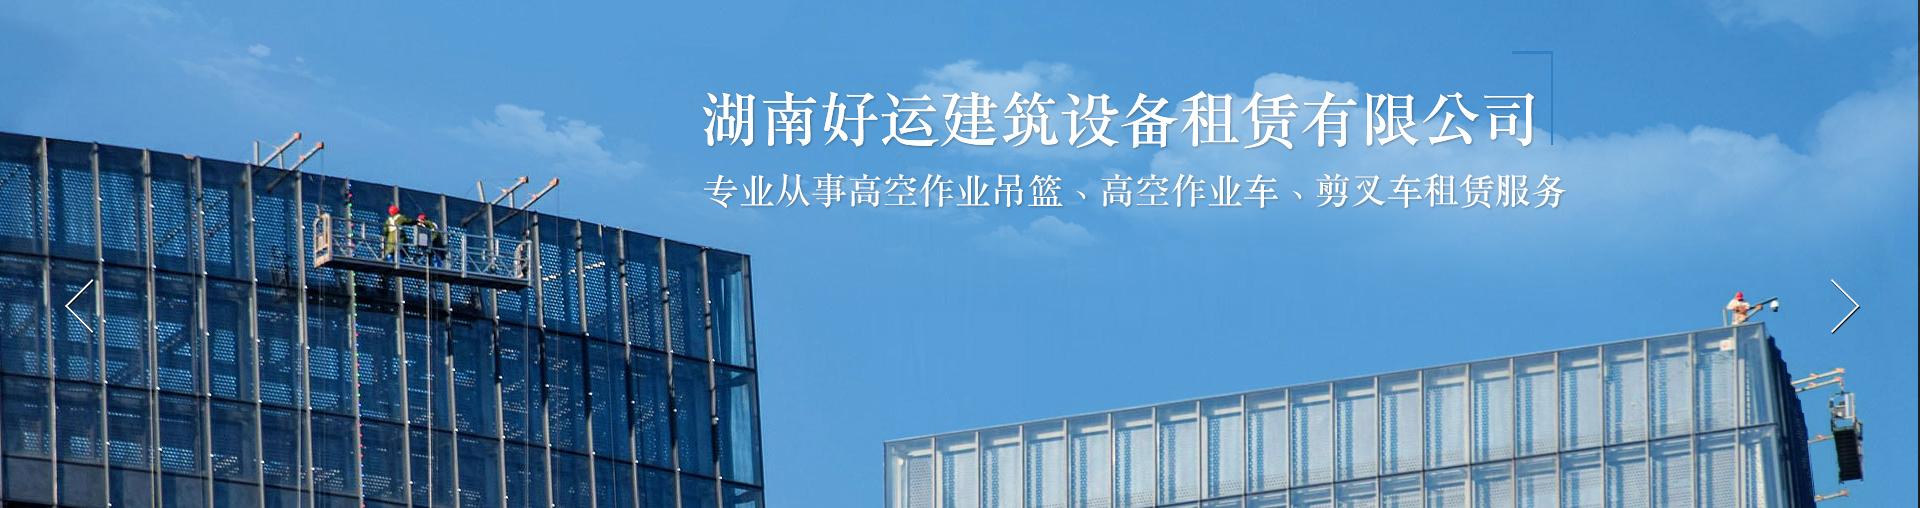 http://www.zz-haoyun.com/data/upload/202108/20210819095111_489.jpg